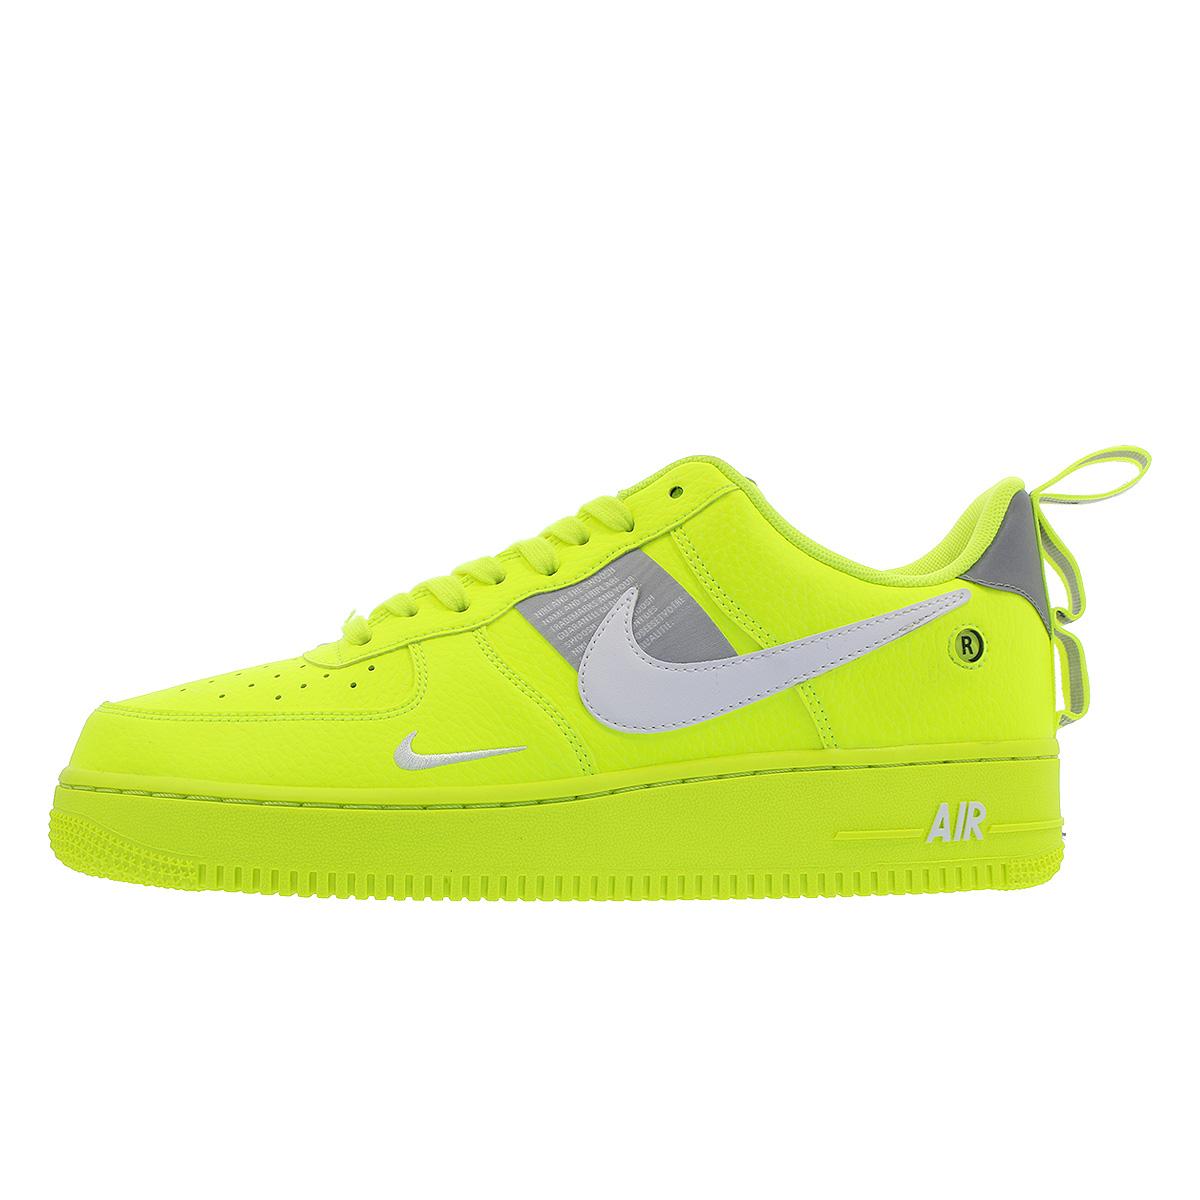 Nike Air Force 1 07 Lv8 Utility Nike Air Force 1 07 Lv8 Utility Volt White Black Wolf Grey Aj7747 700